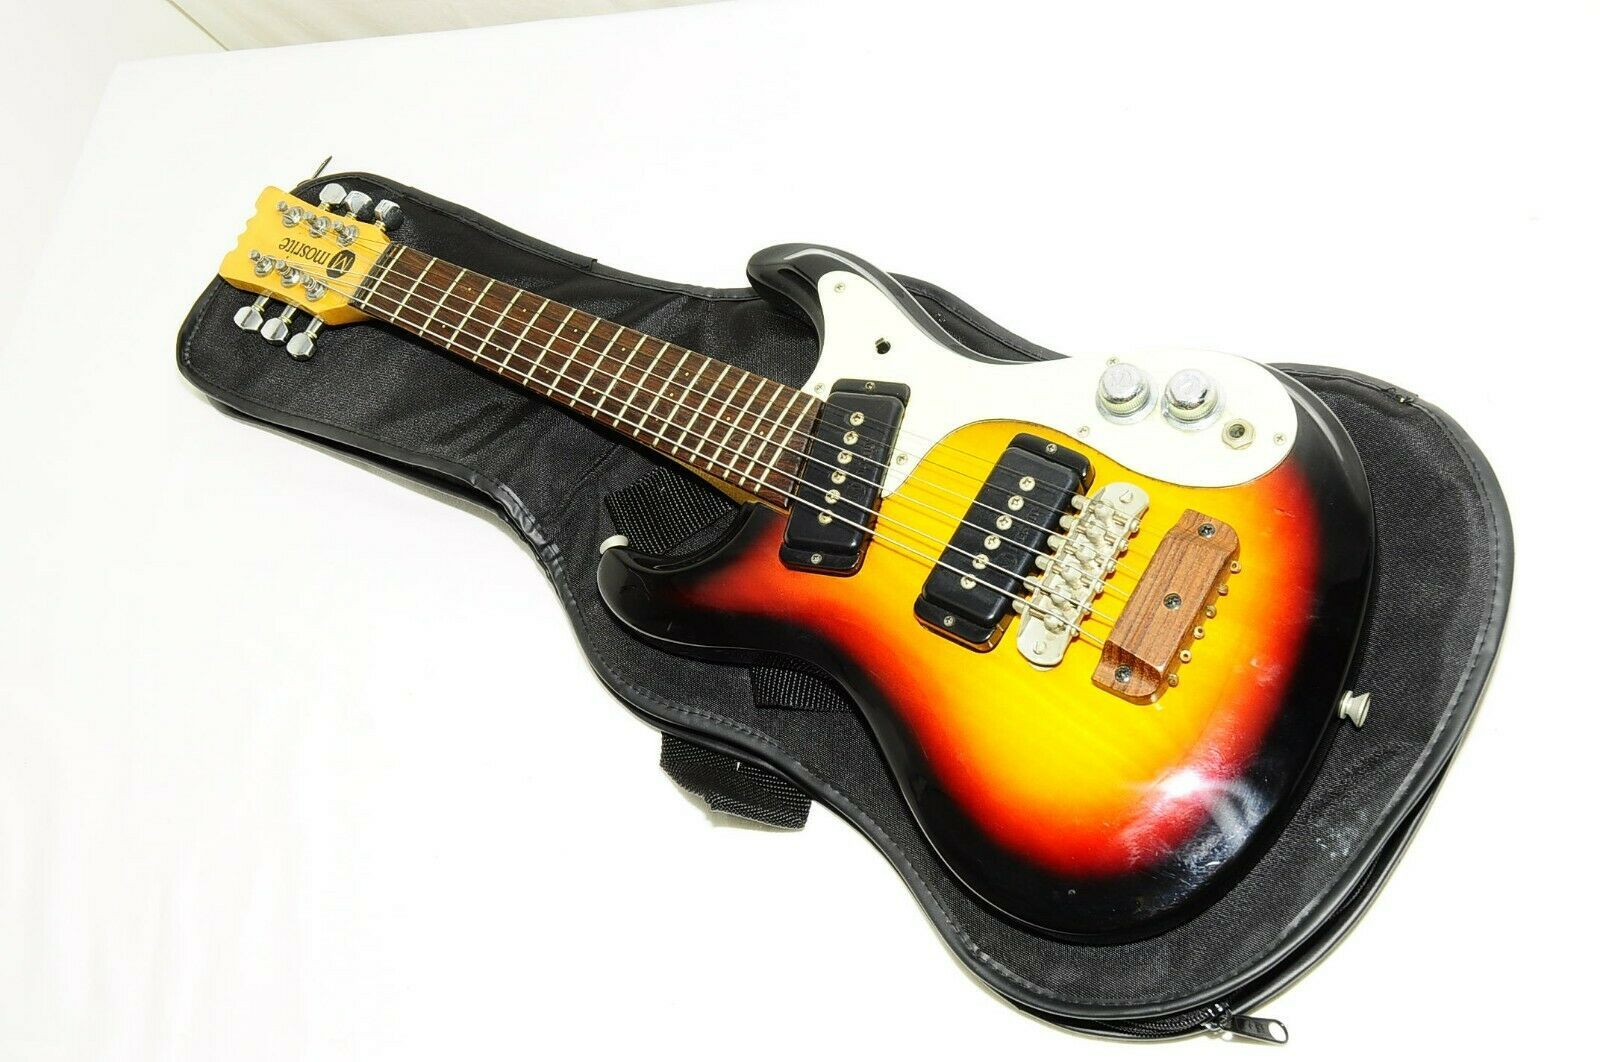 Mosrite Mini Travel Guitar Sunburst Electric Guitar Ref No 2199 Ebay Electric Guitar Guitar Japanese Guitar